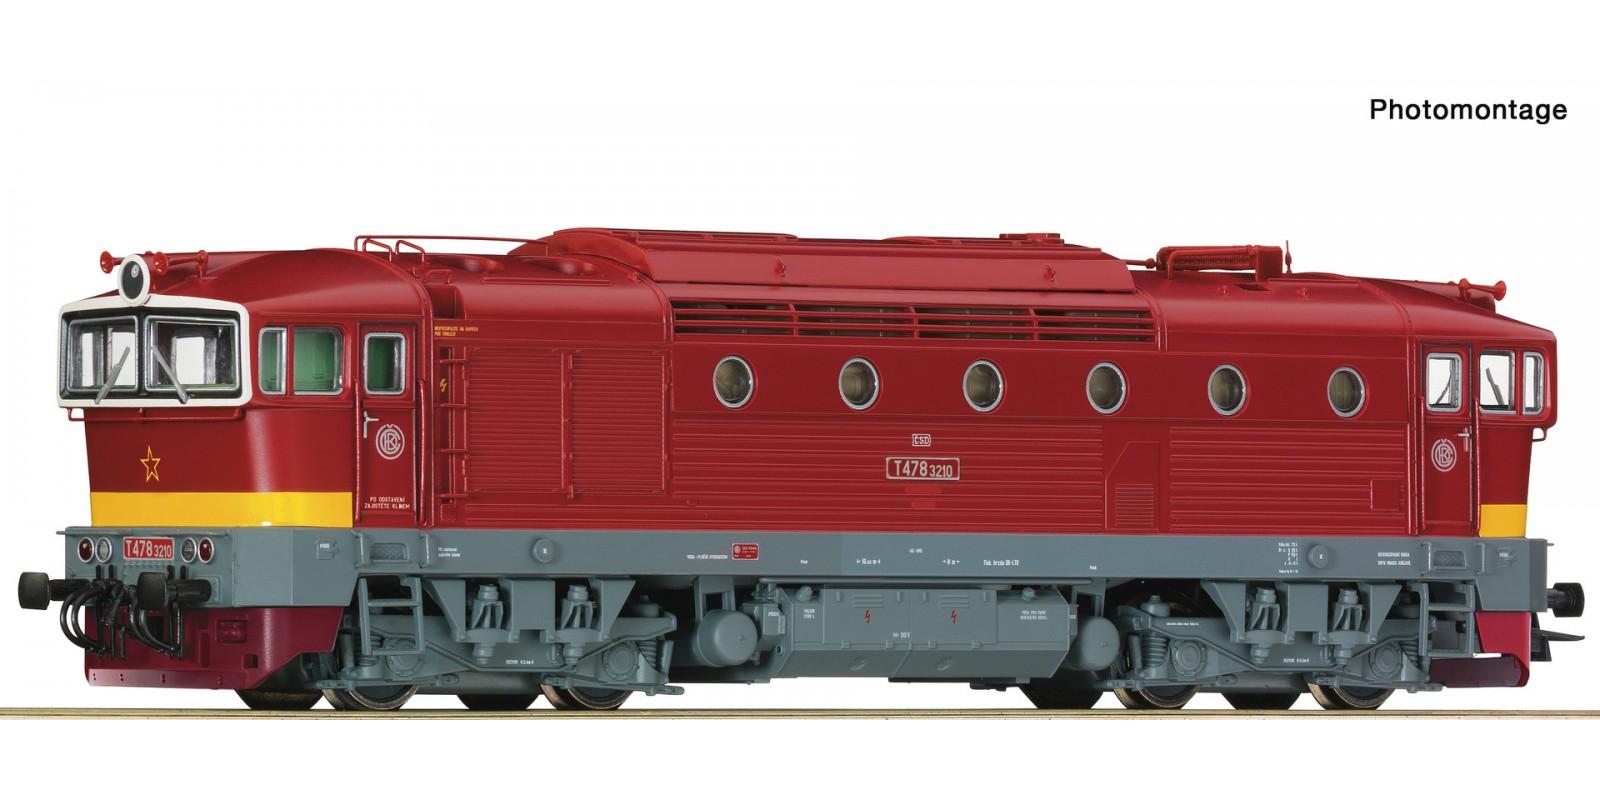 RO72947 Diesel locomotive class T 478.3